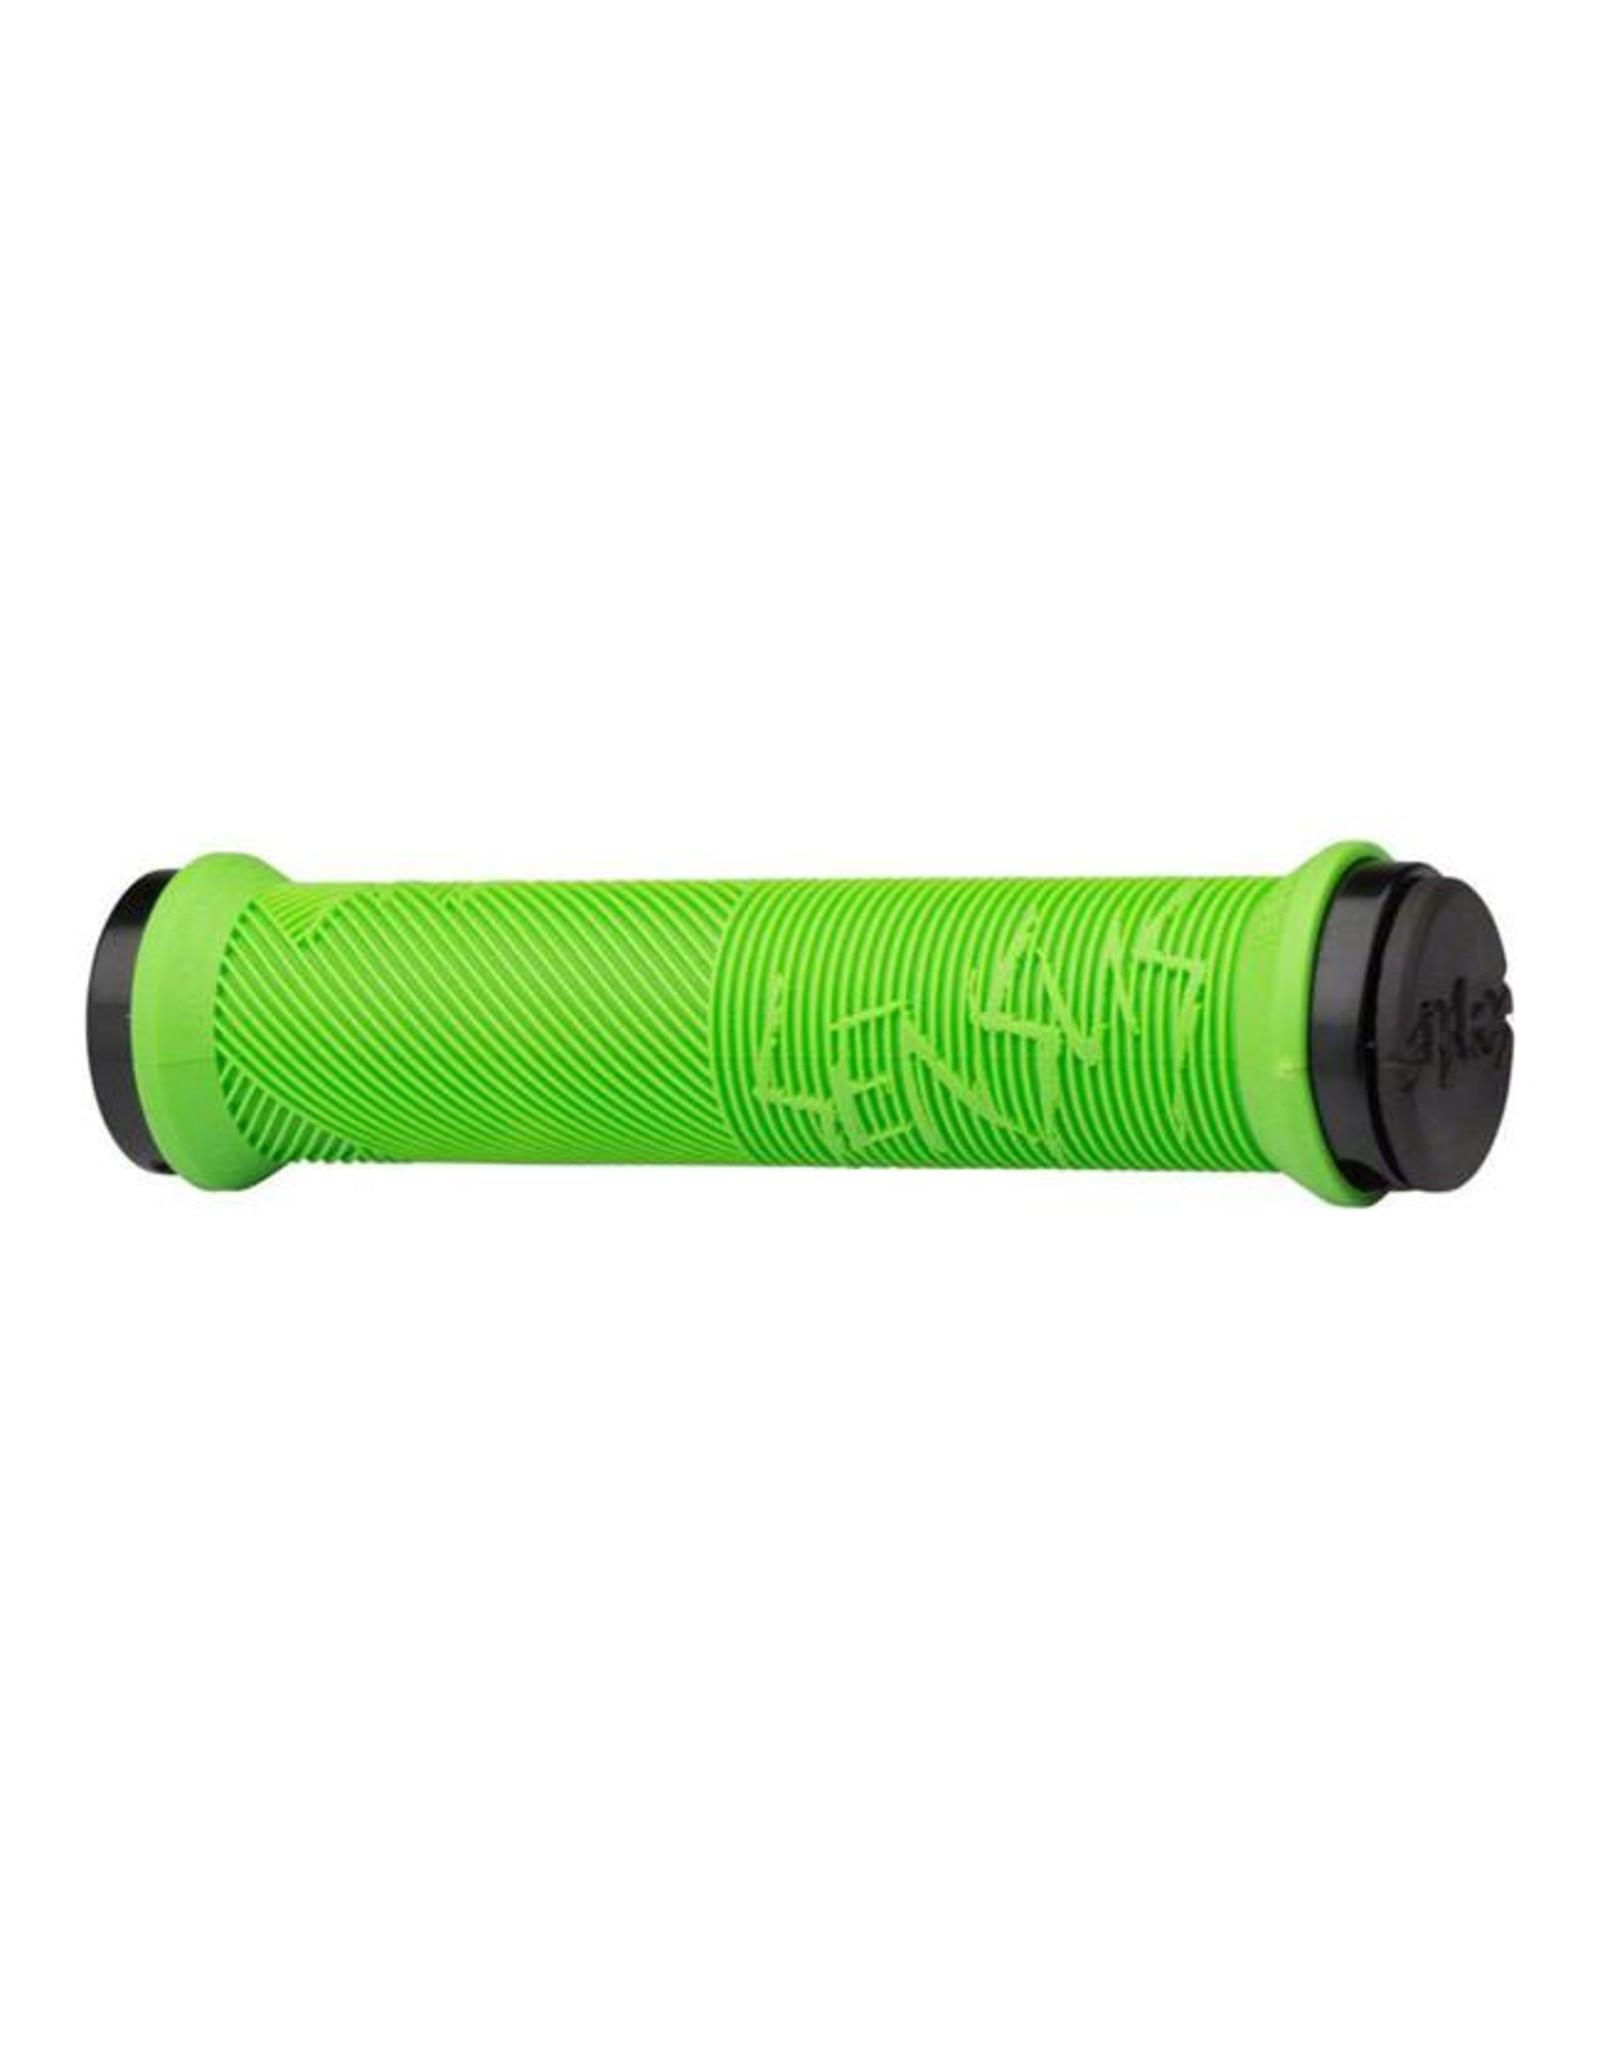 ODI ODI Sensus Disisdaboss Lock-On Grips 143mm Lime Green